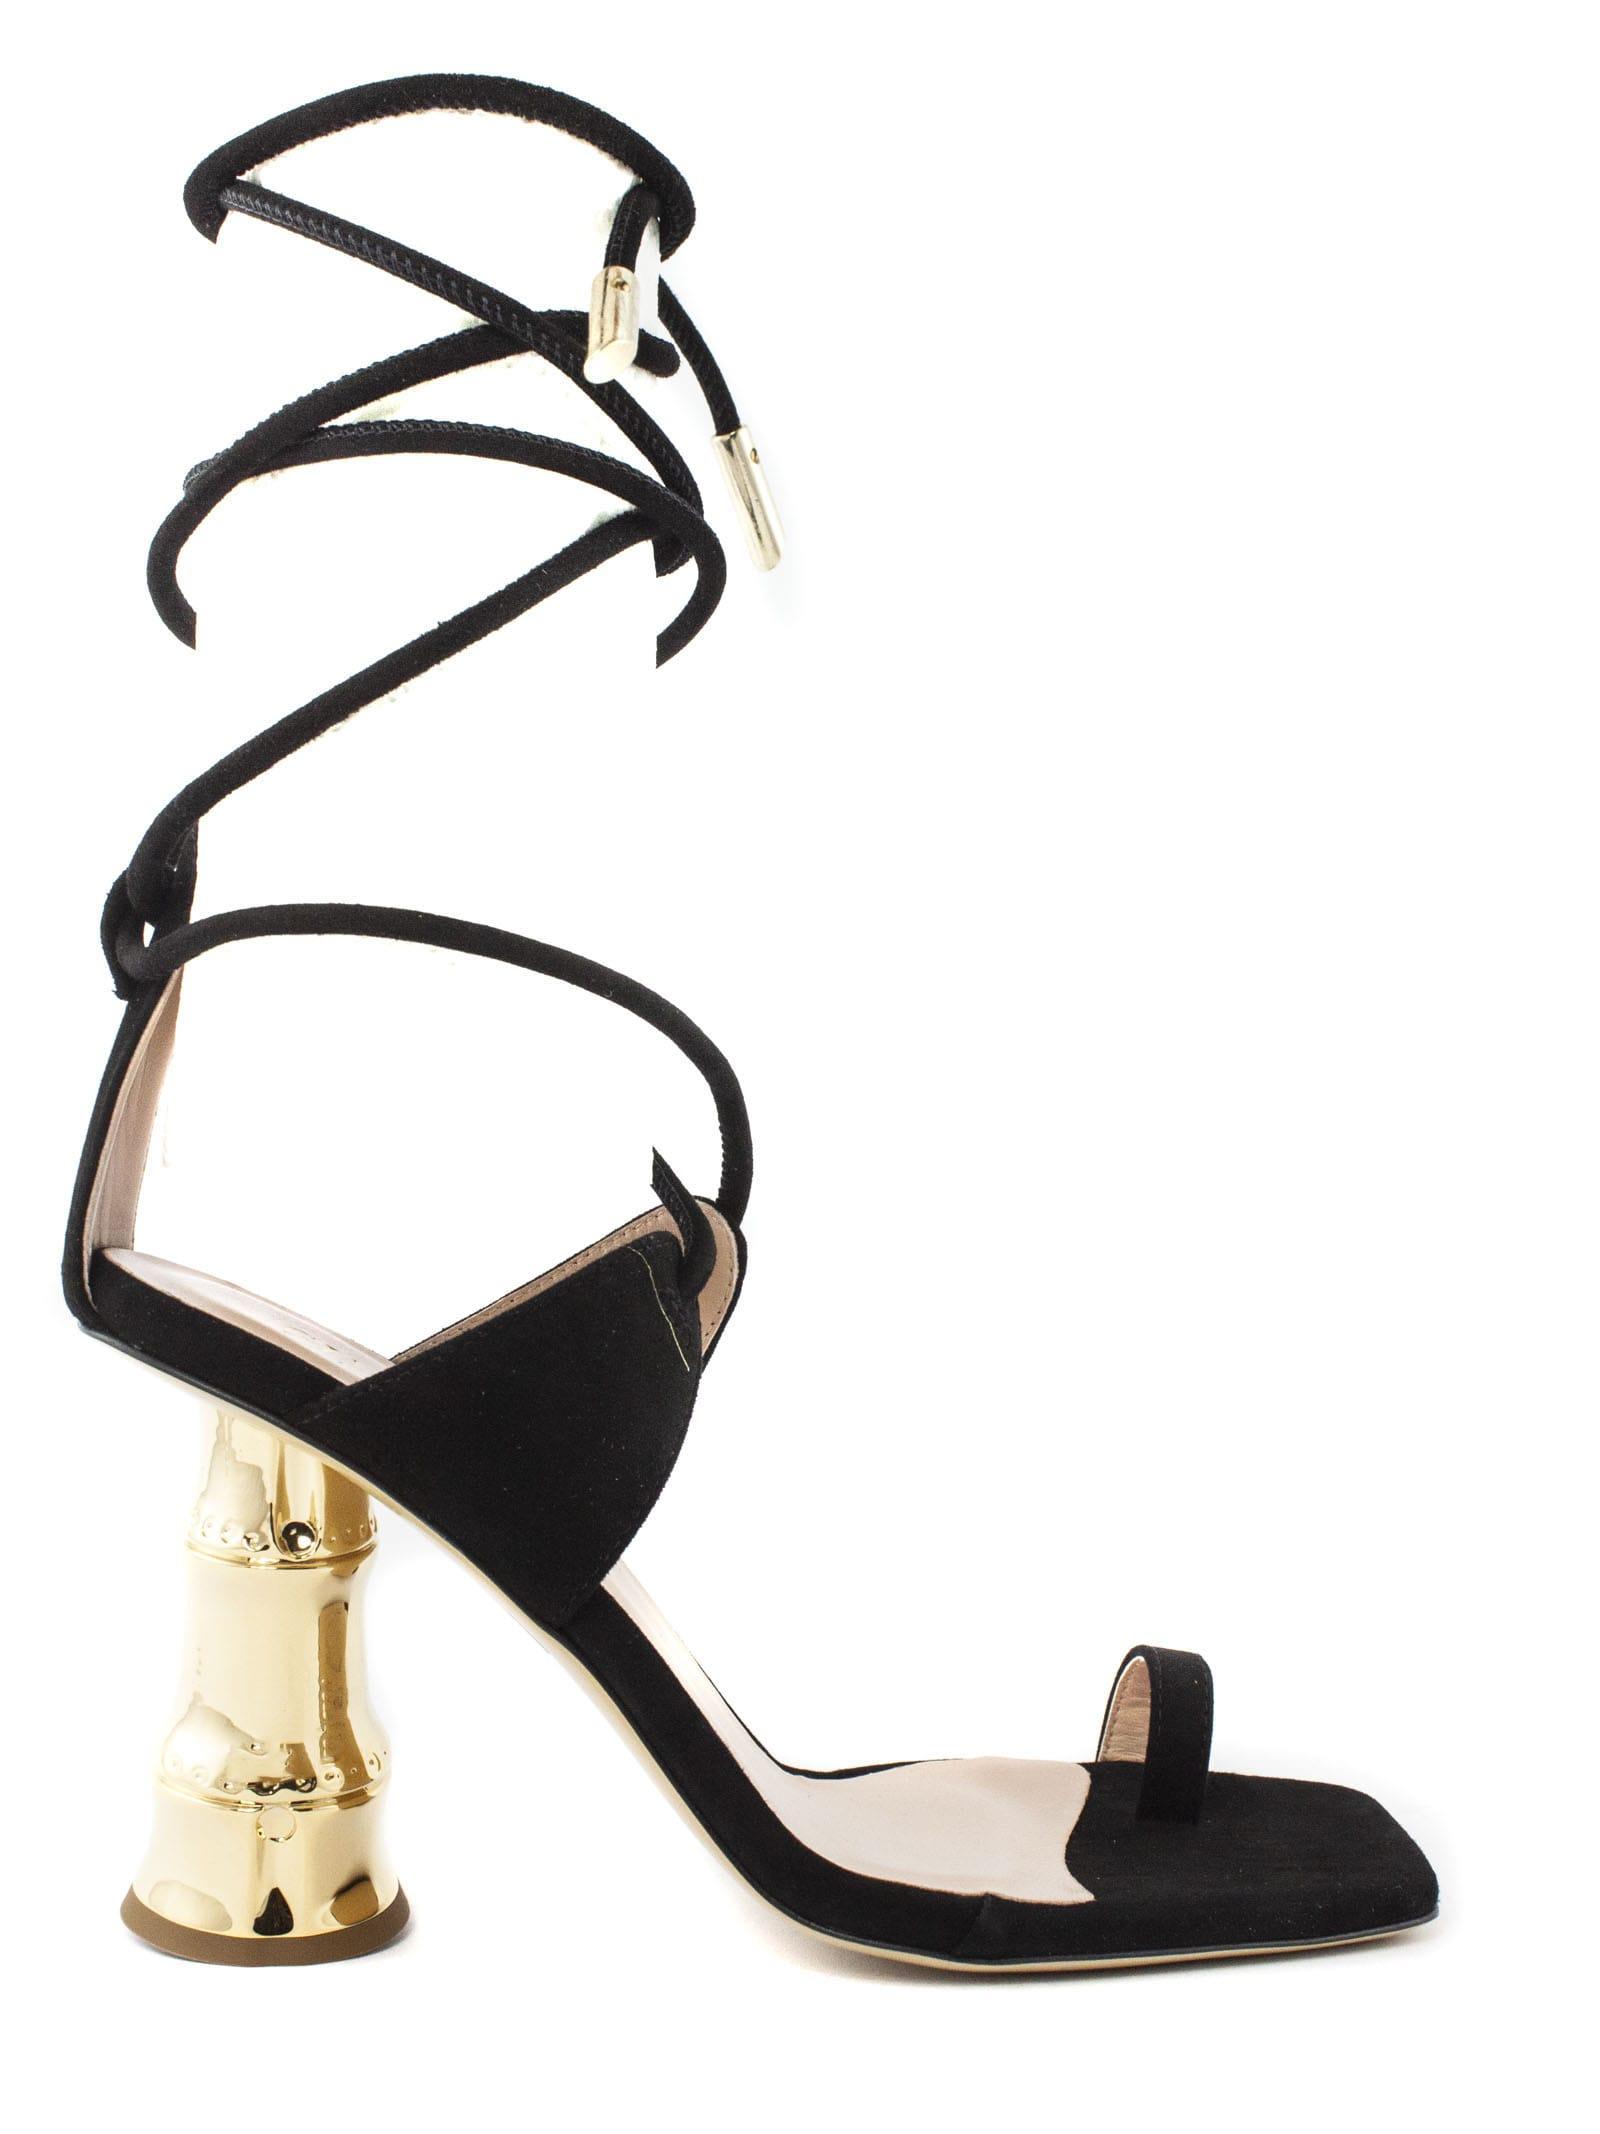 Gia Couture AQUILONE BLACK SUEDE SANDALS